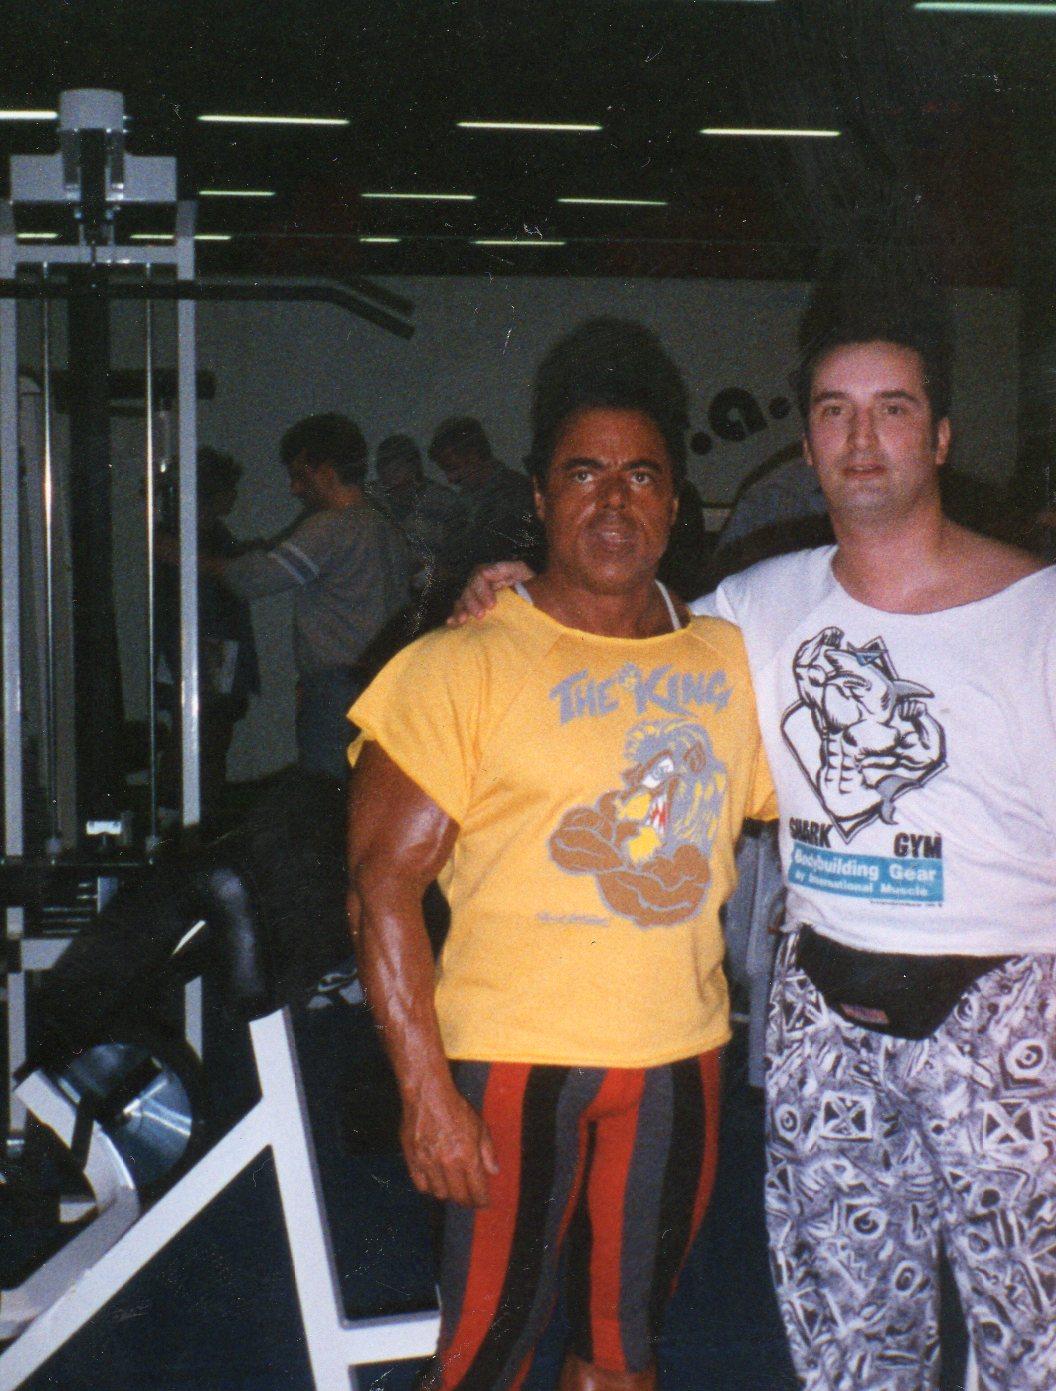 http://images.onlc.eu/muscle-catrinOEU//130608015864.jpg